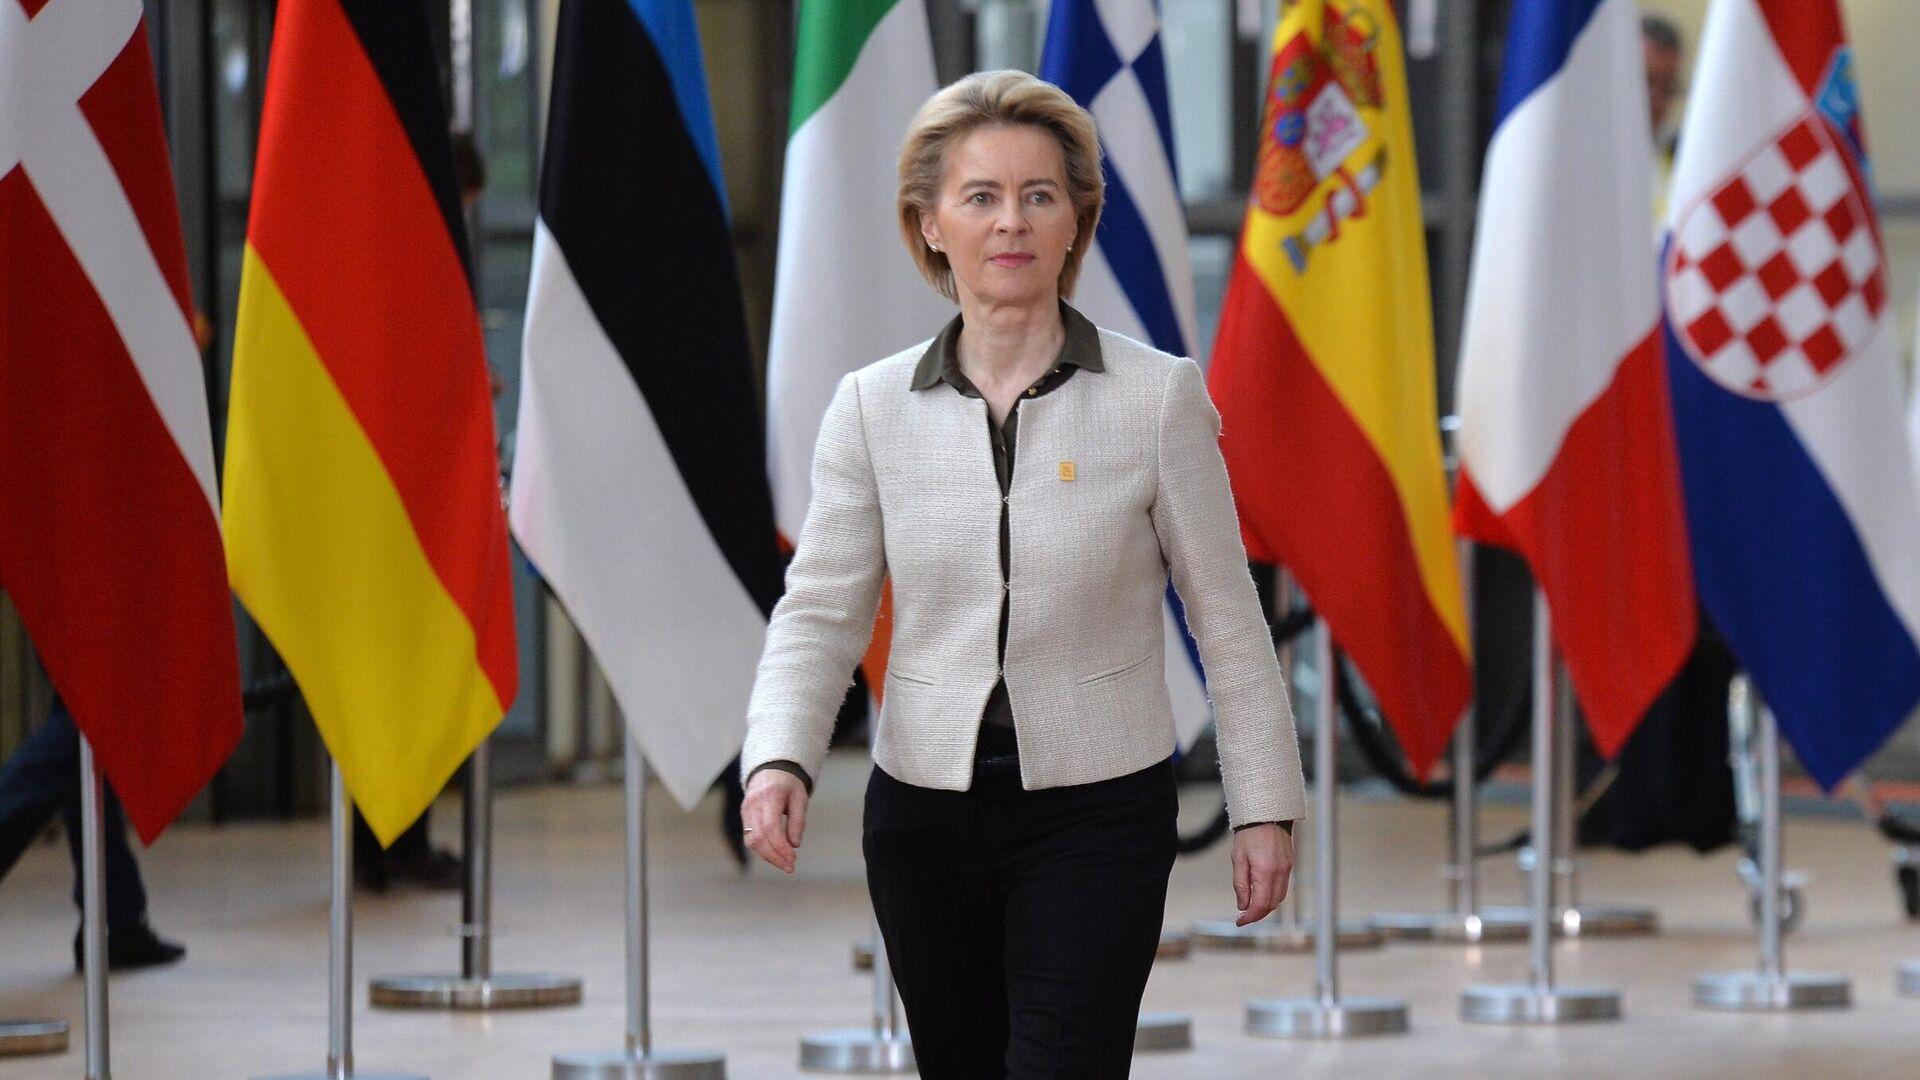 Председатель Европейской комиссии Урсула фон дер Ляйен на саммите ЕС в Брюсселе - РИА Новости, 1920, 17.02.2021